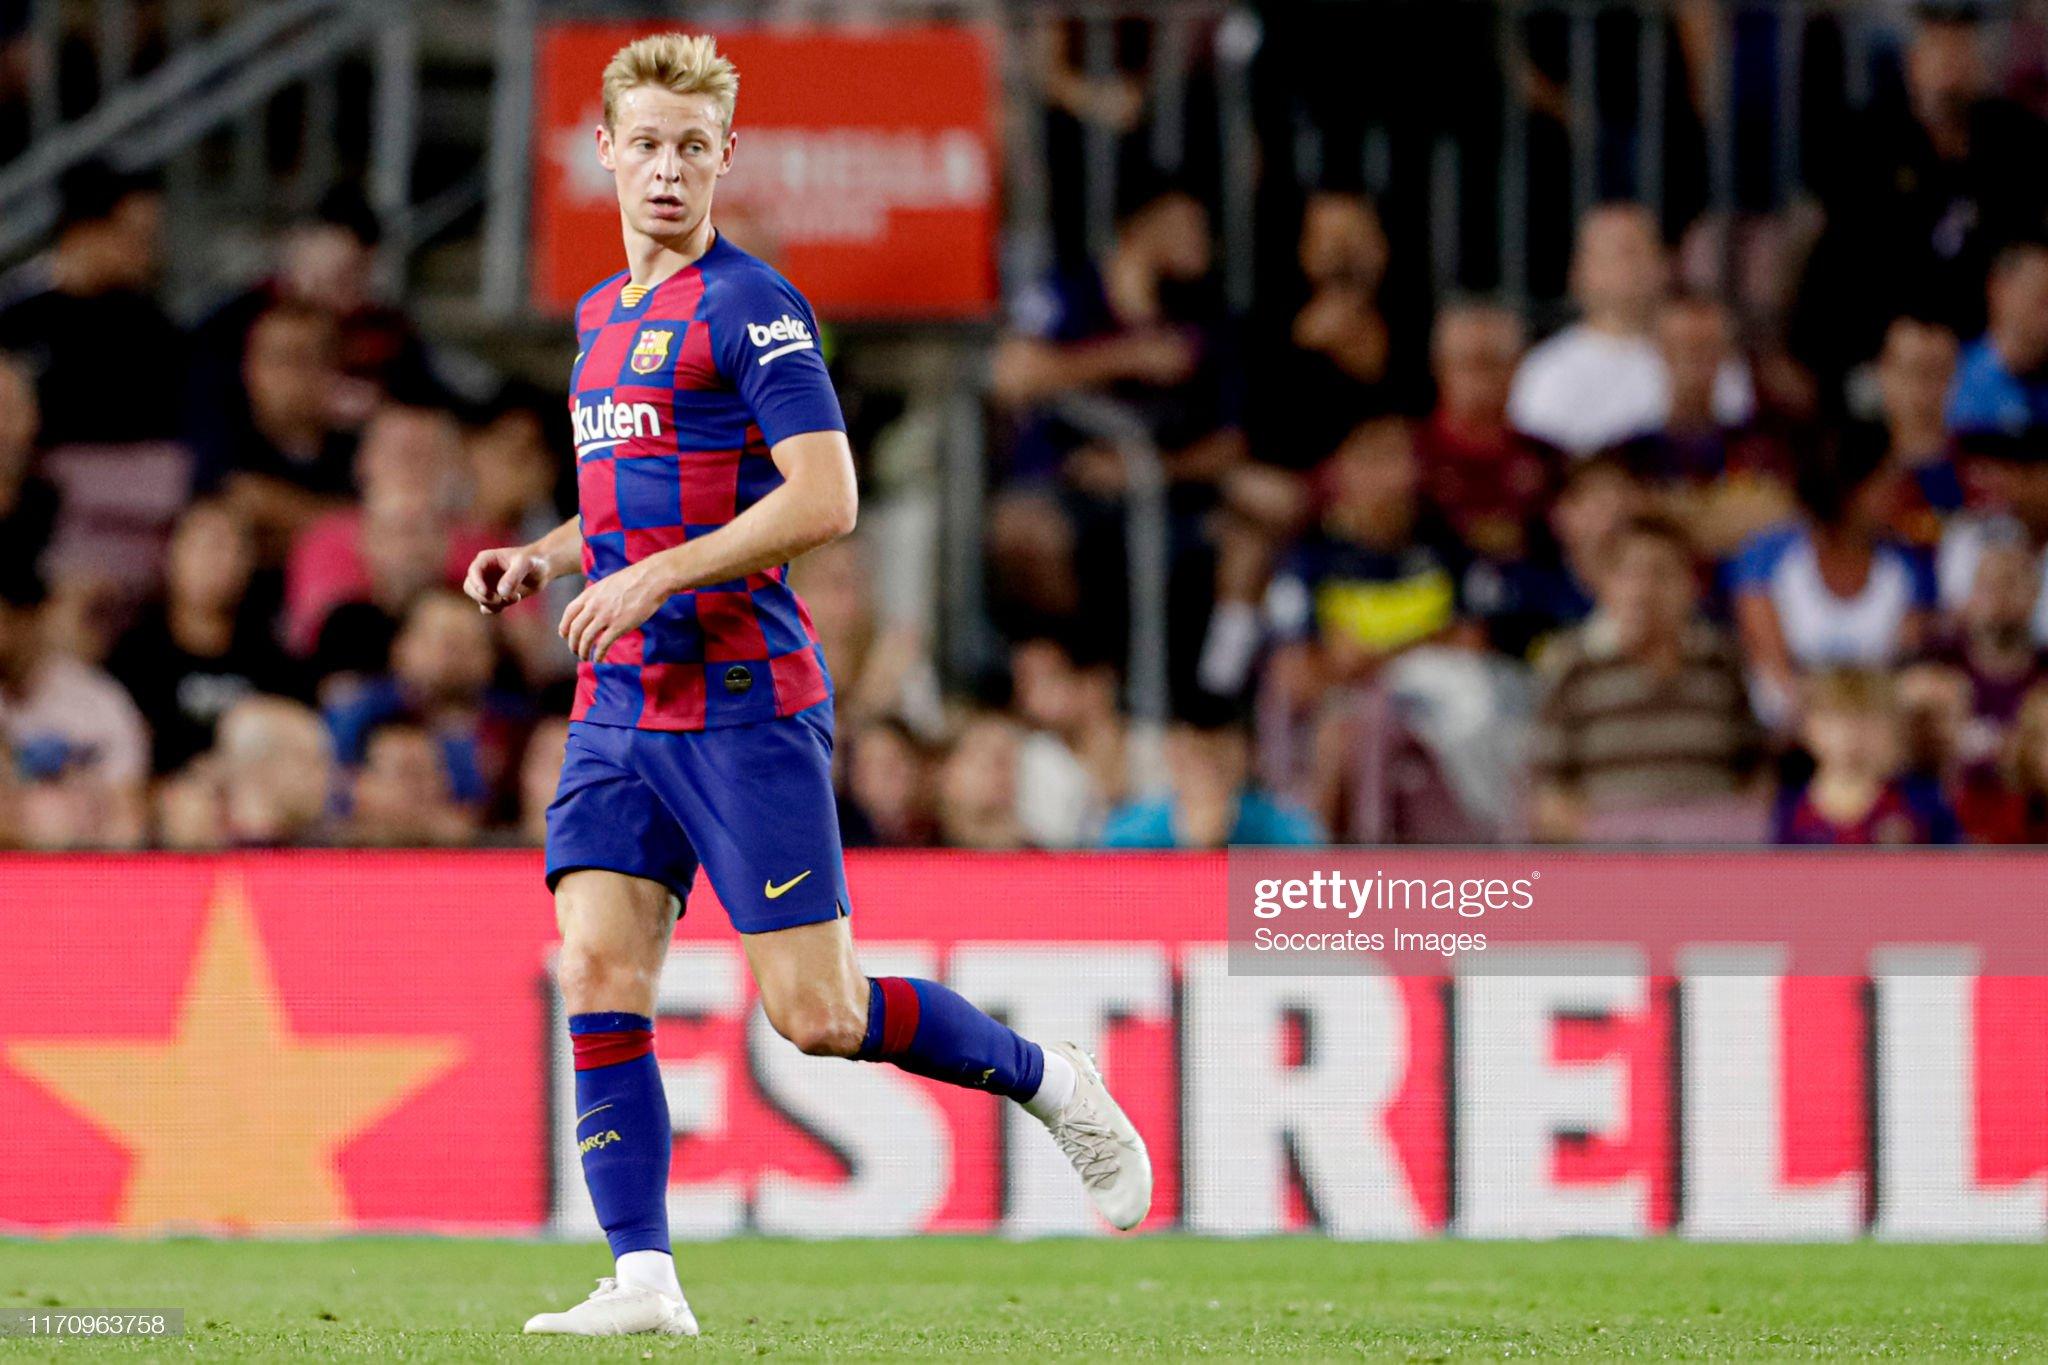 صور مباراة : برشلونة - فياريال 2-1 ( 24-09-2019 )  Frenkie-de-jong-of-fc-barcelona-during-the-la-liga-santander-match-picture-id1170963758?s=2048x2048